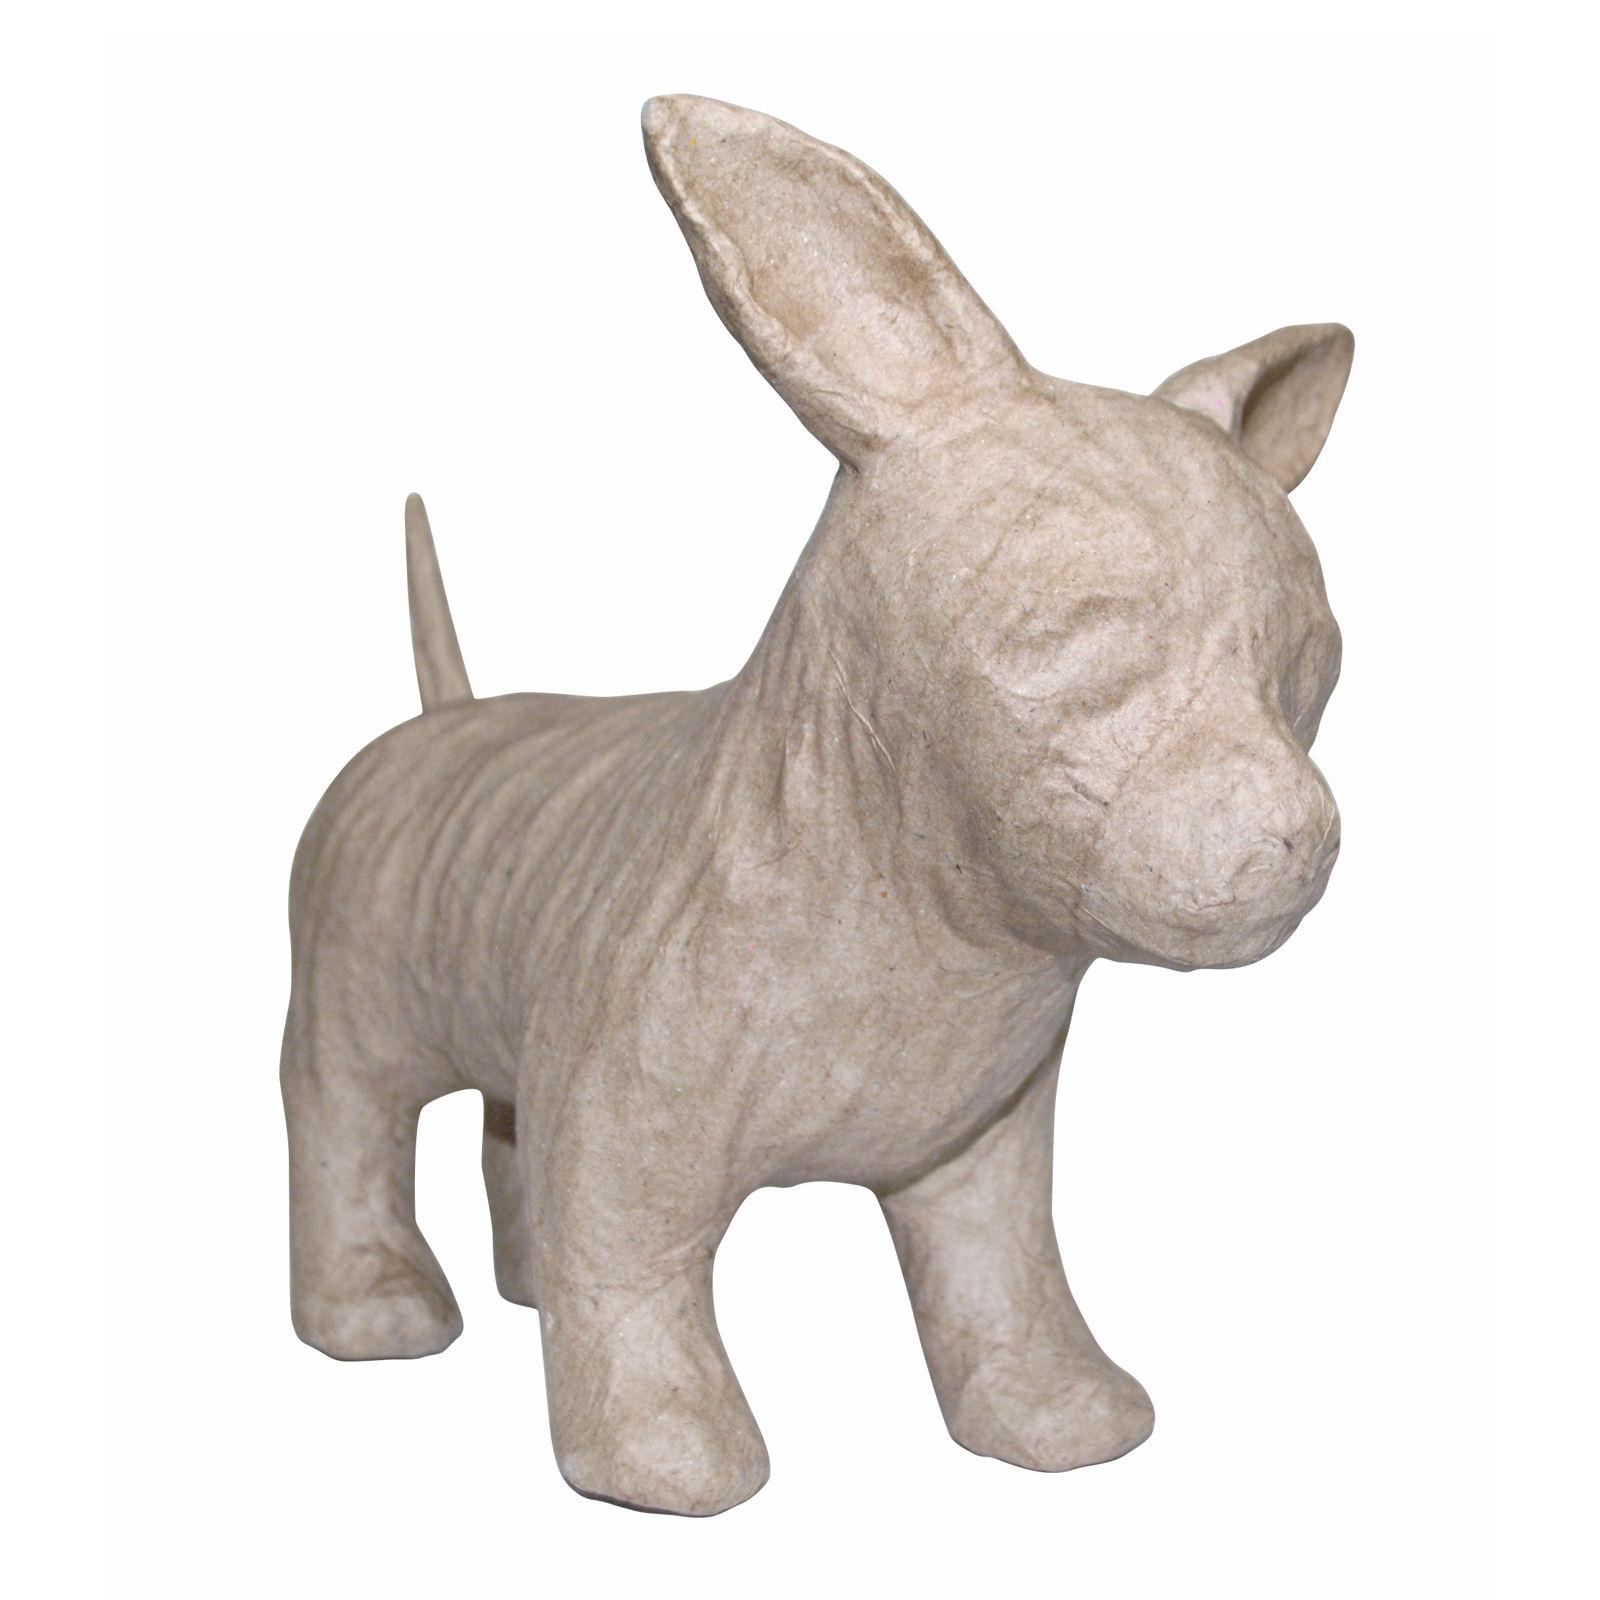 Decopatch sa150 decoupage papier mache animal chihuahua ebay for Decopatch papier